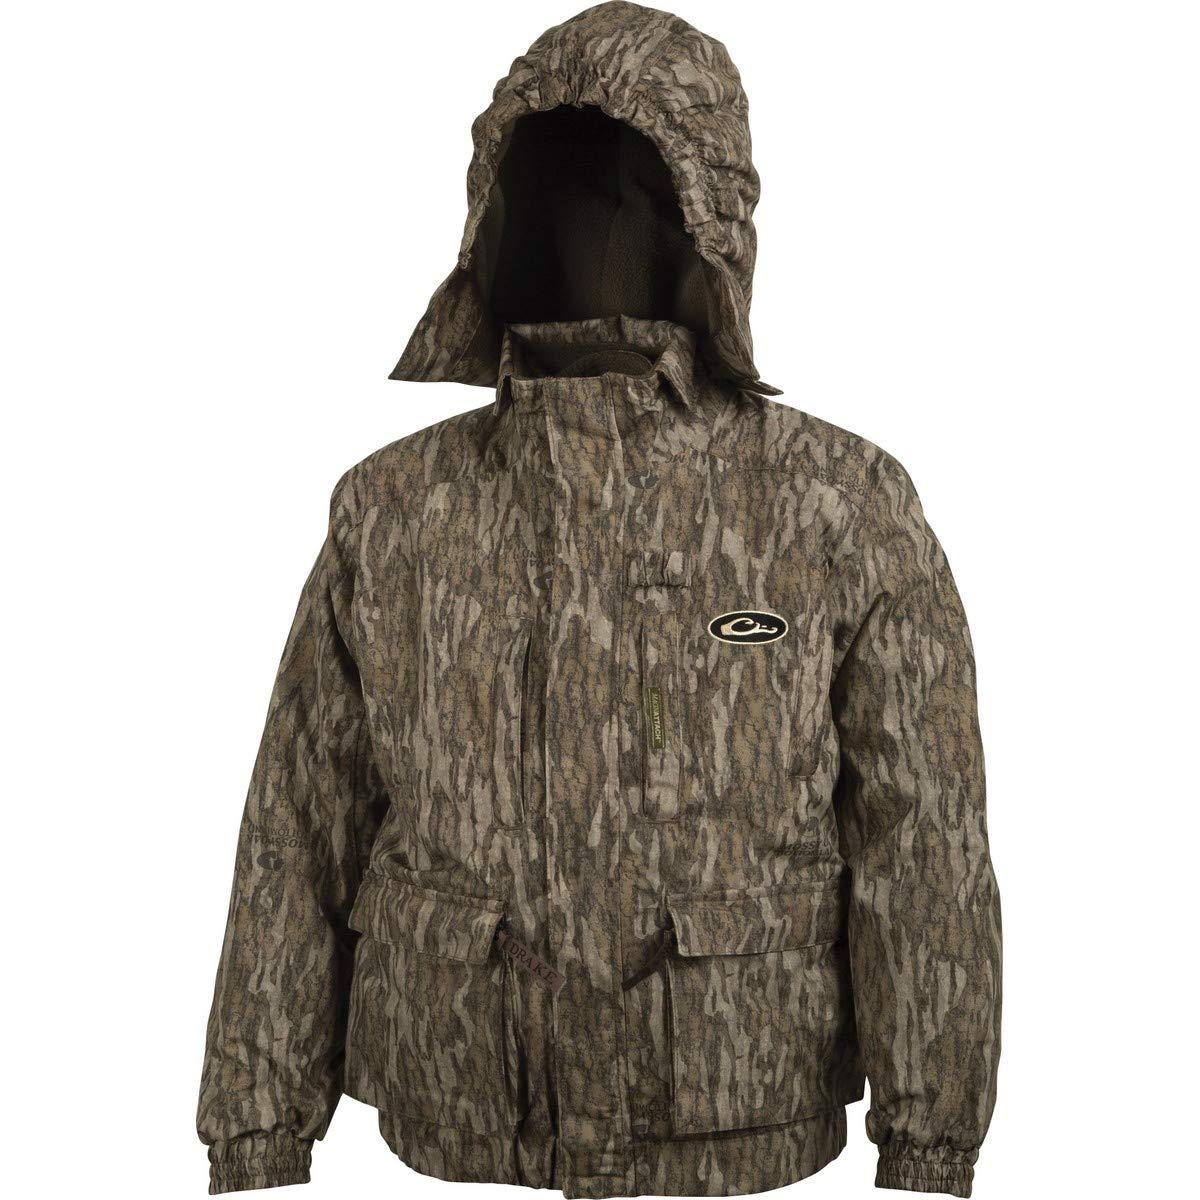 Drake Young Guns Youth 3-N-1 Jacket 10 Mossy Oak Bottomland by Drake